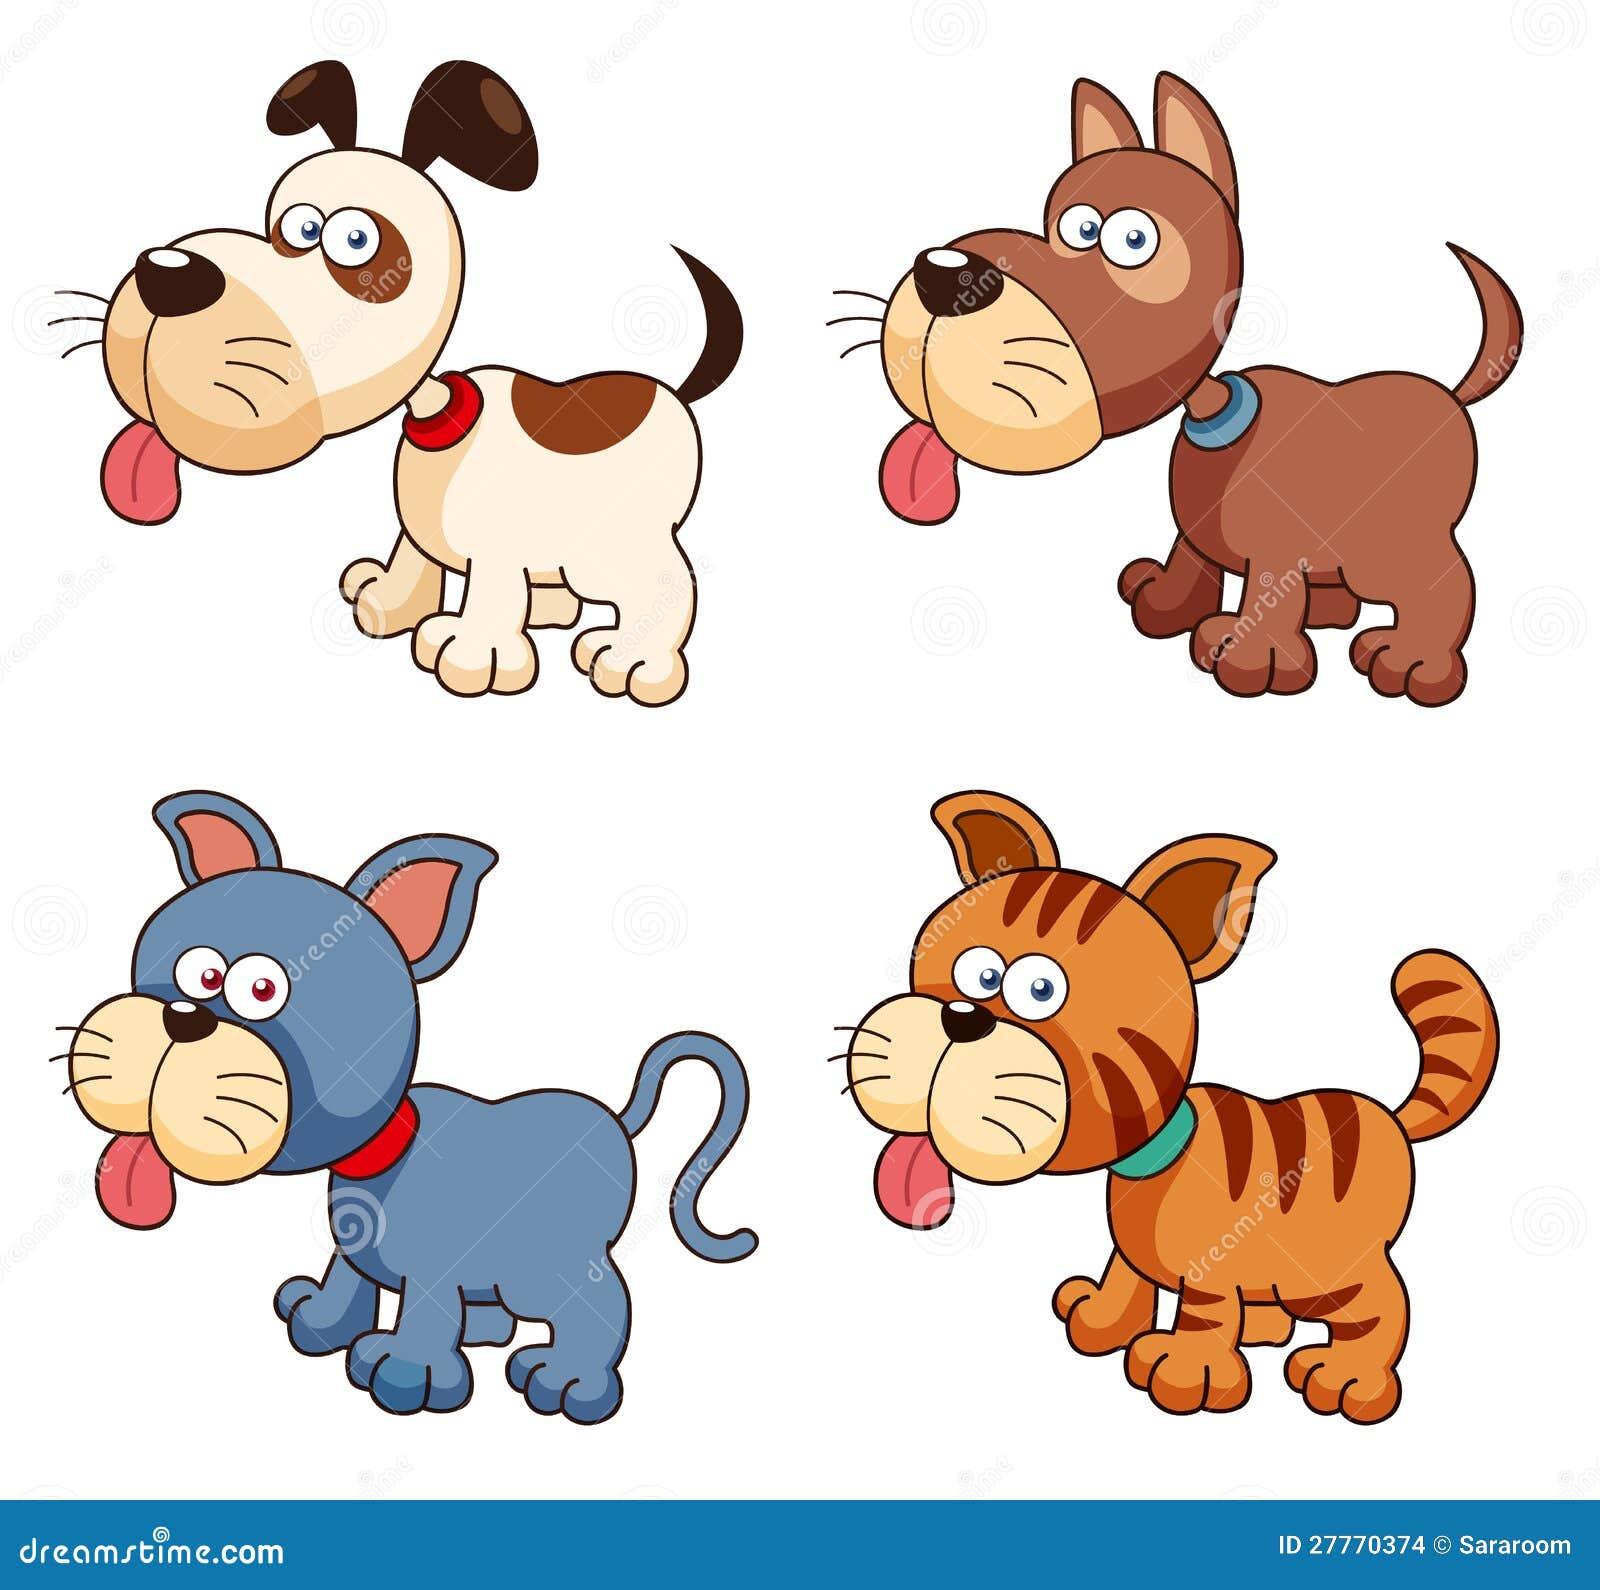 Cartoon Dogs Stock Illustrations 17 140 Cartoon Dogs Stock Illustrations Vectors Clipart Dreamstime